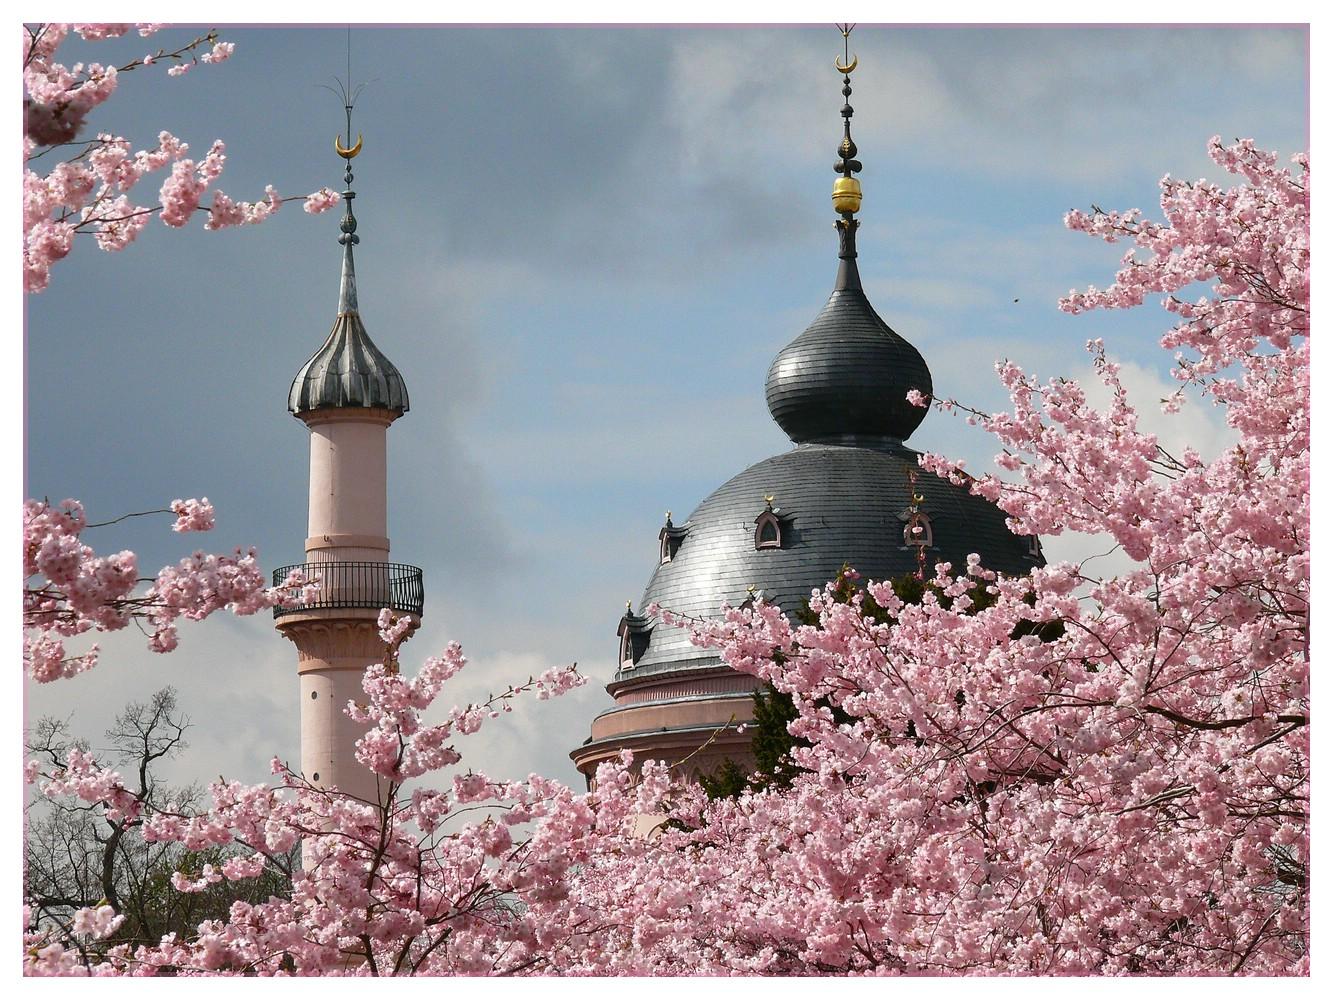 ~ Moschee in rose ~